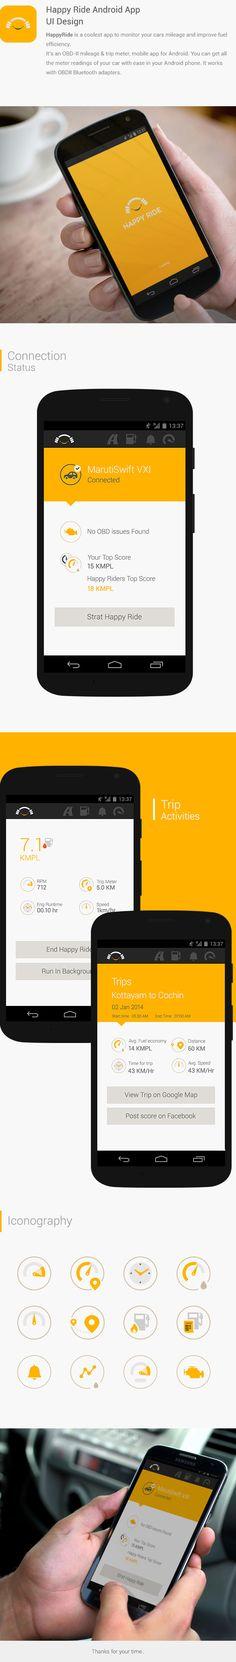 Happy Ride - Android App by vijilal tharaniyil, via Behance App Ui Design, Mobile App Design, Web Design, Android App Icon, Android Apps, Ios App, App Promotion, Mobile App Ui, Ui Design Inspiration